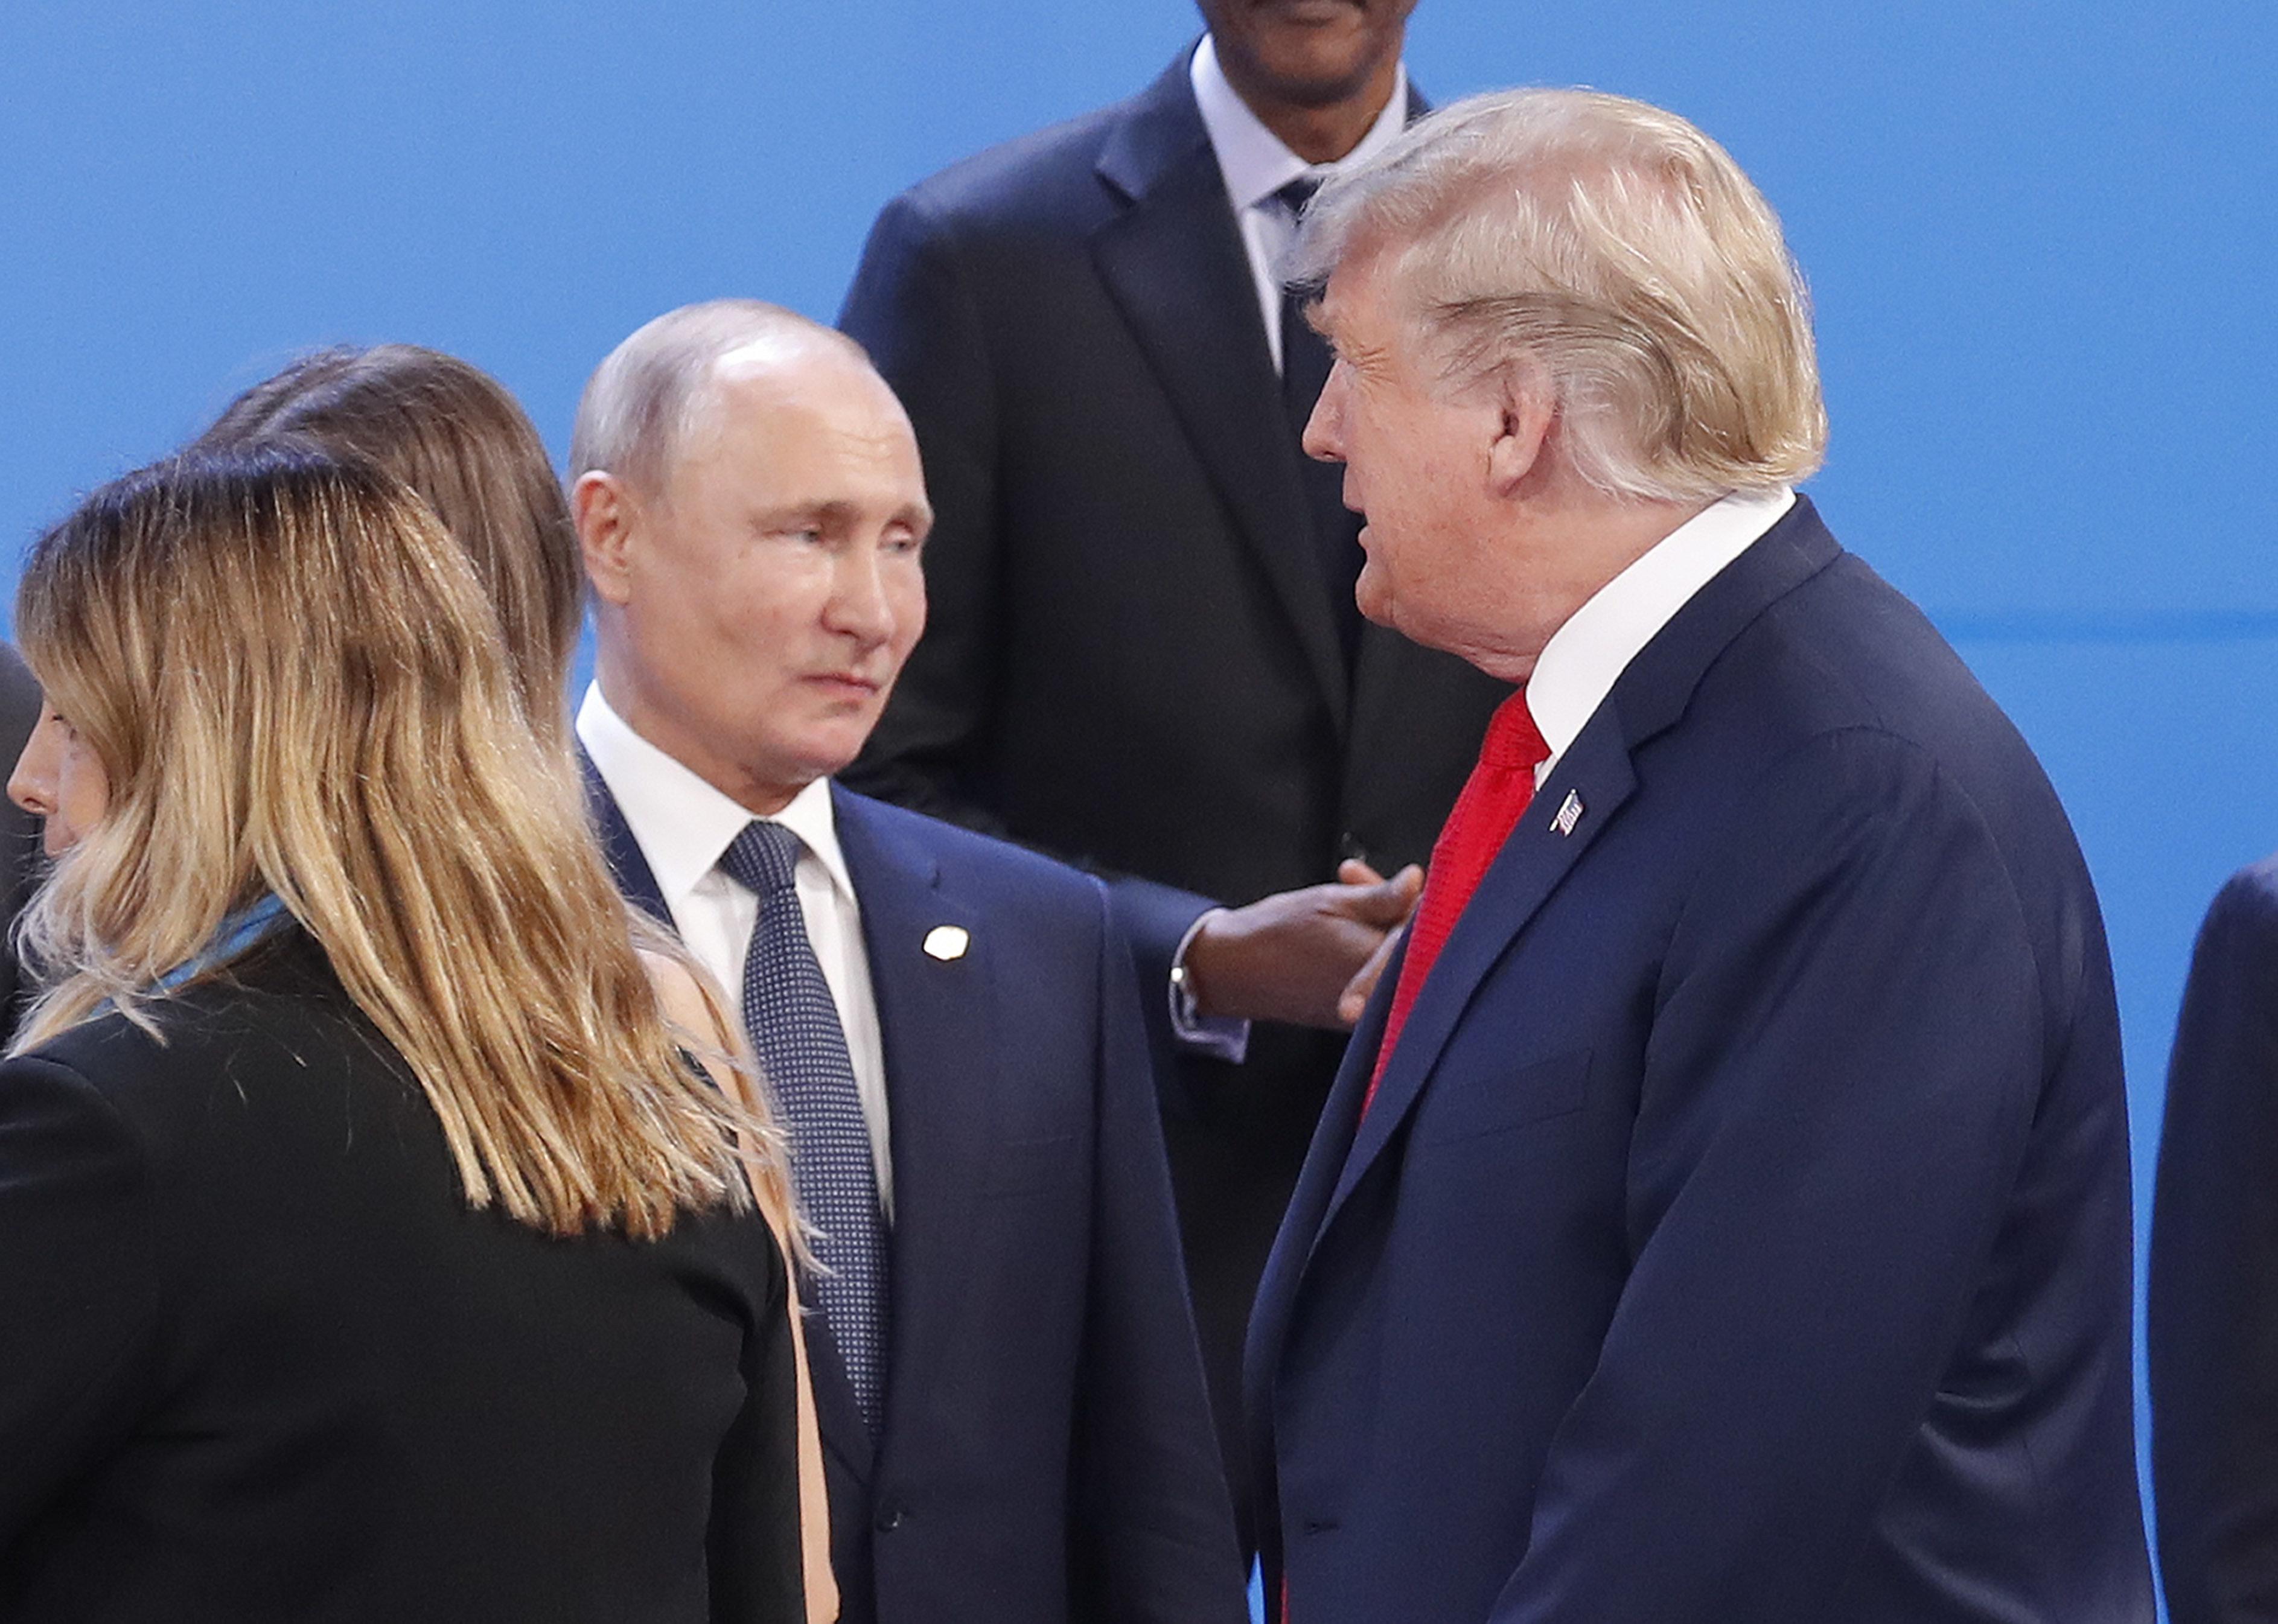 Westlake Legal Group 5c3b990125000031007daf31 GOP Shrugs Off Report That Trump Concealed Details Of Putin Meetings